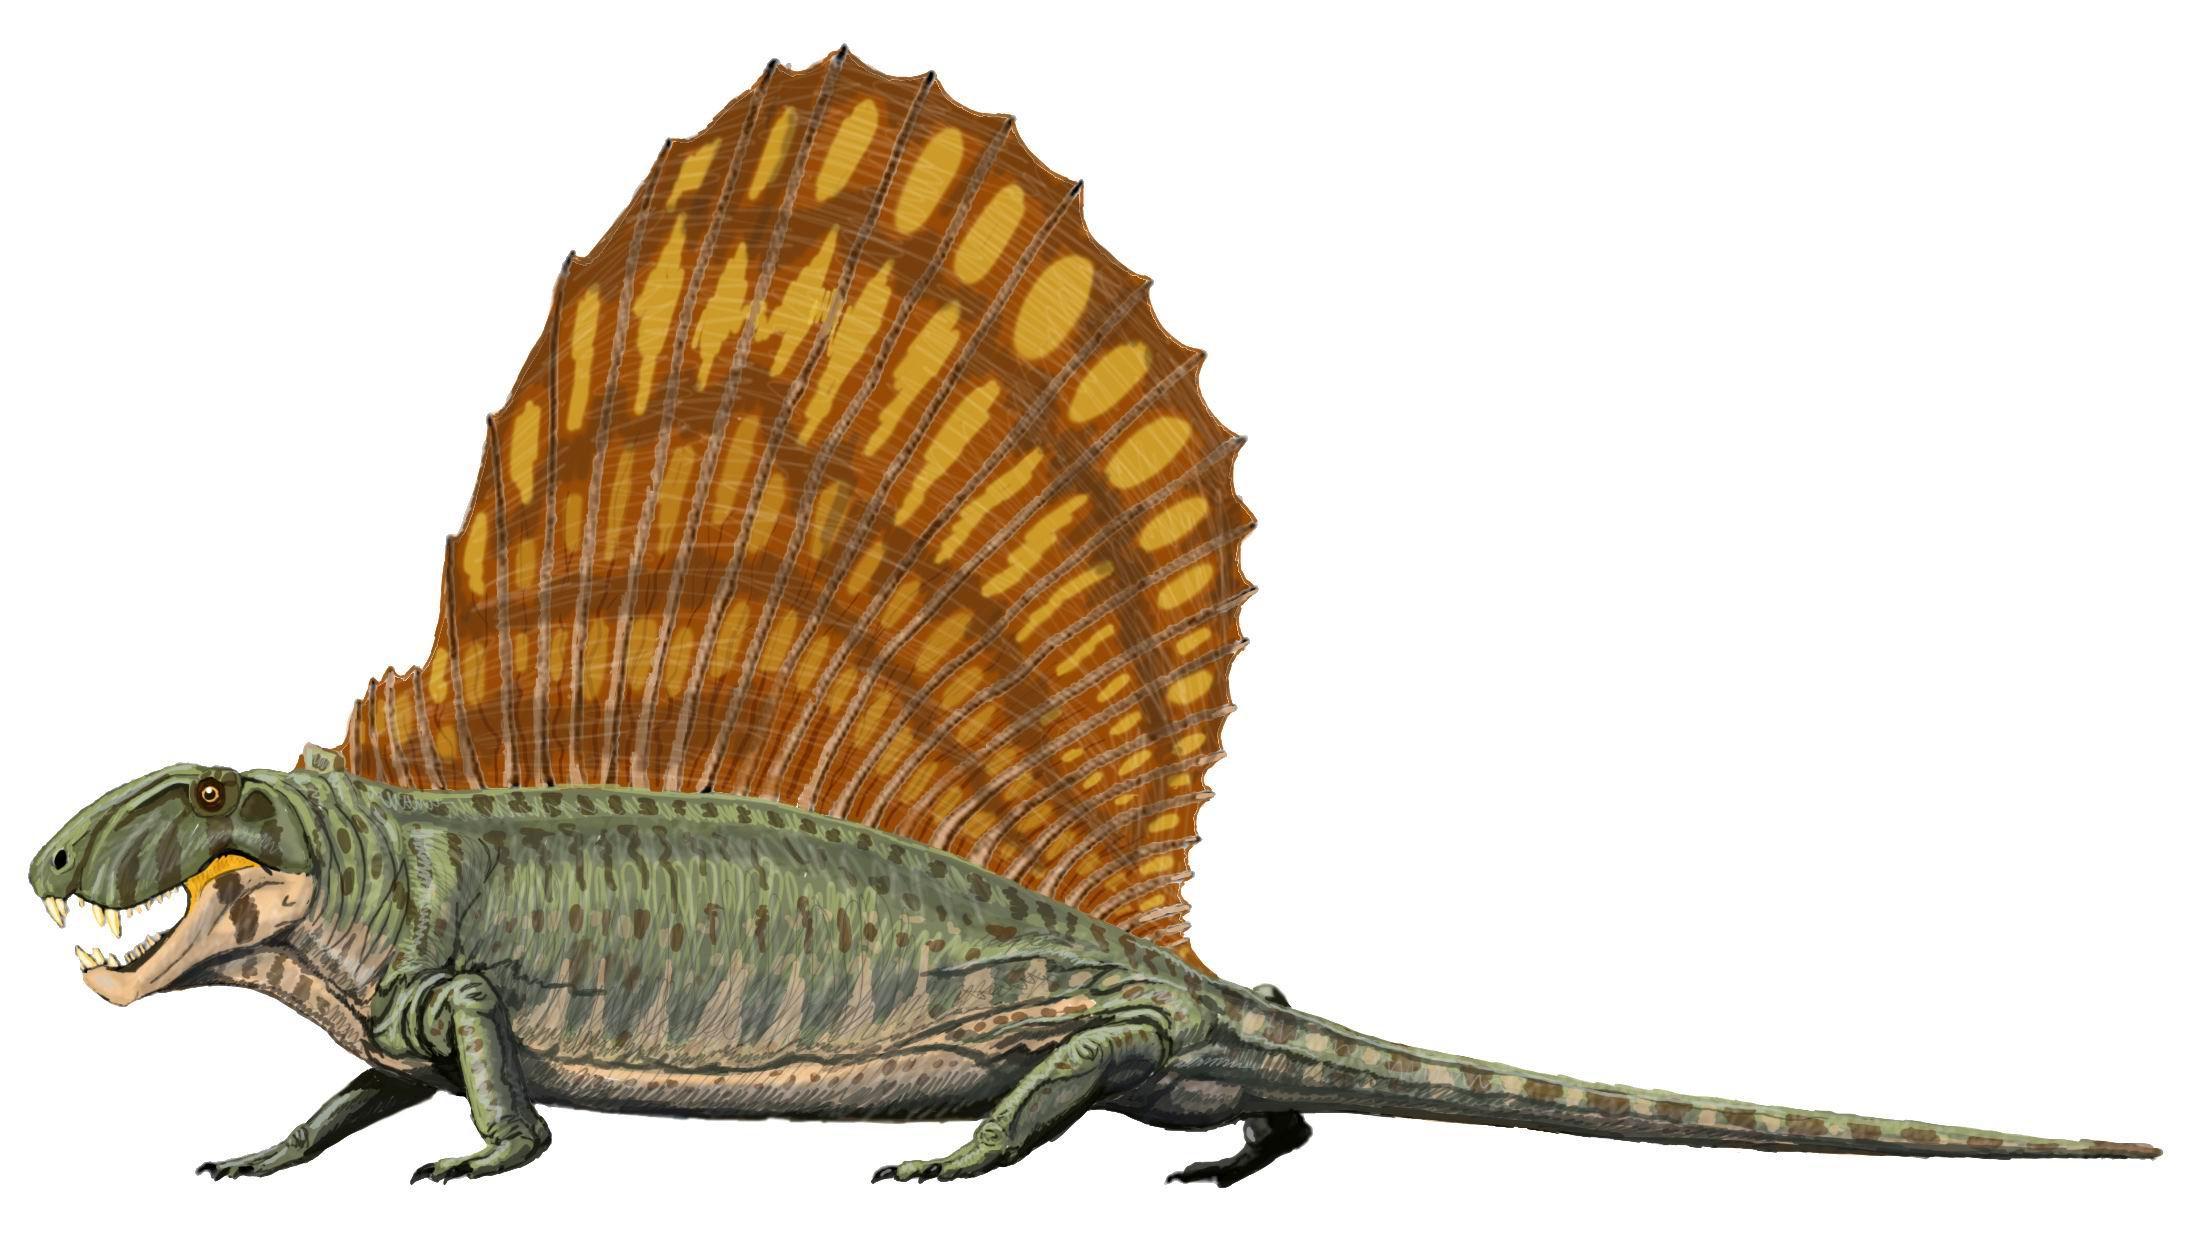 Source:https://commons.wikimedia.org/wiki/File:Dimetrodon_grandis.jpg Dimetrodon illustration